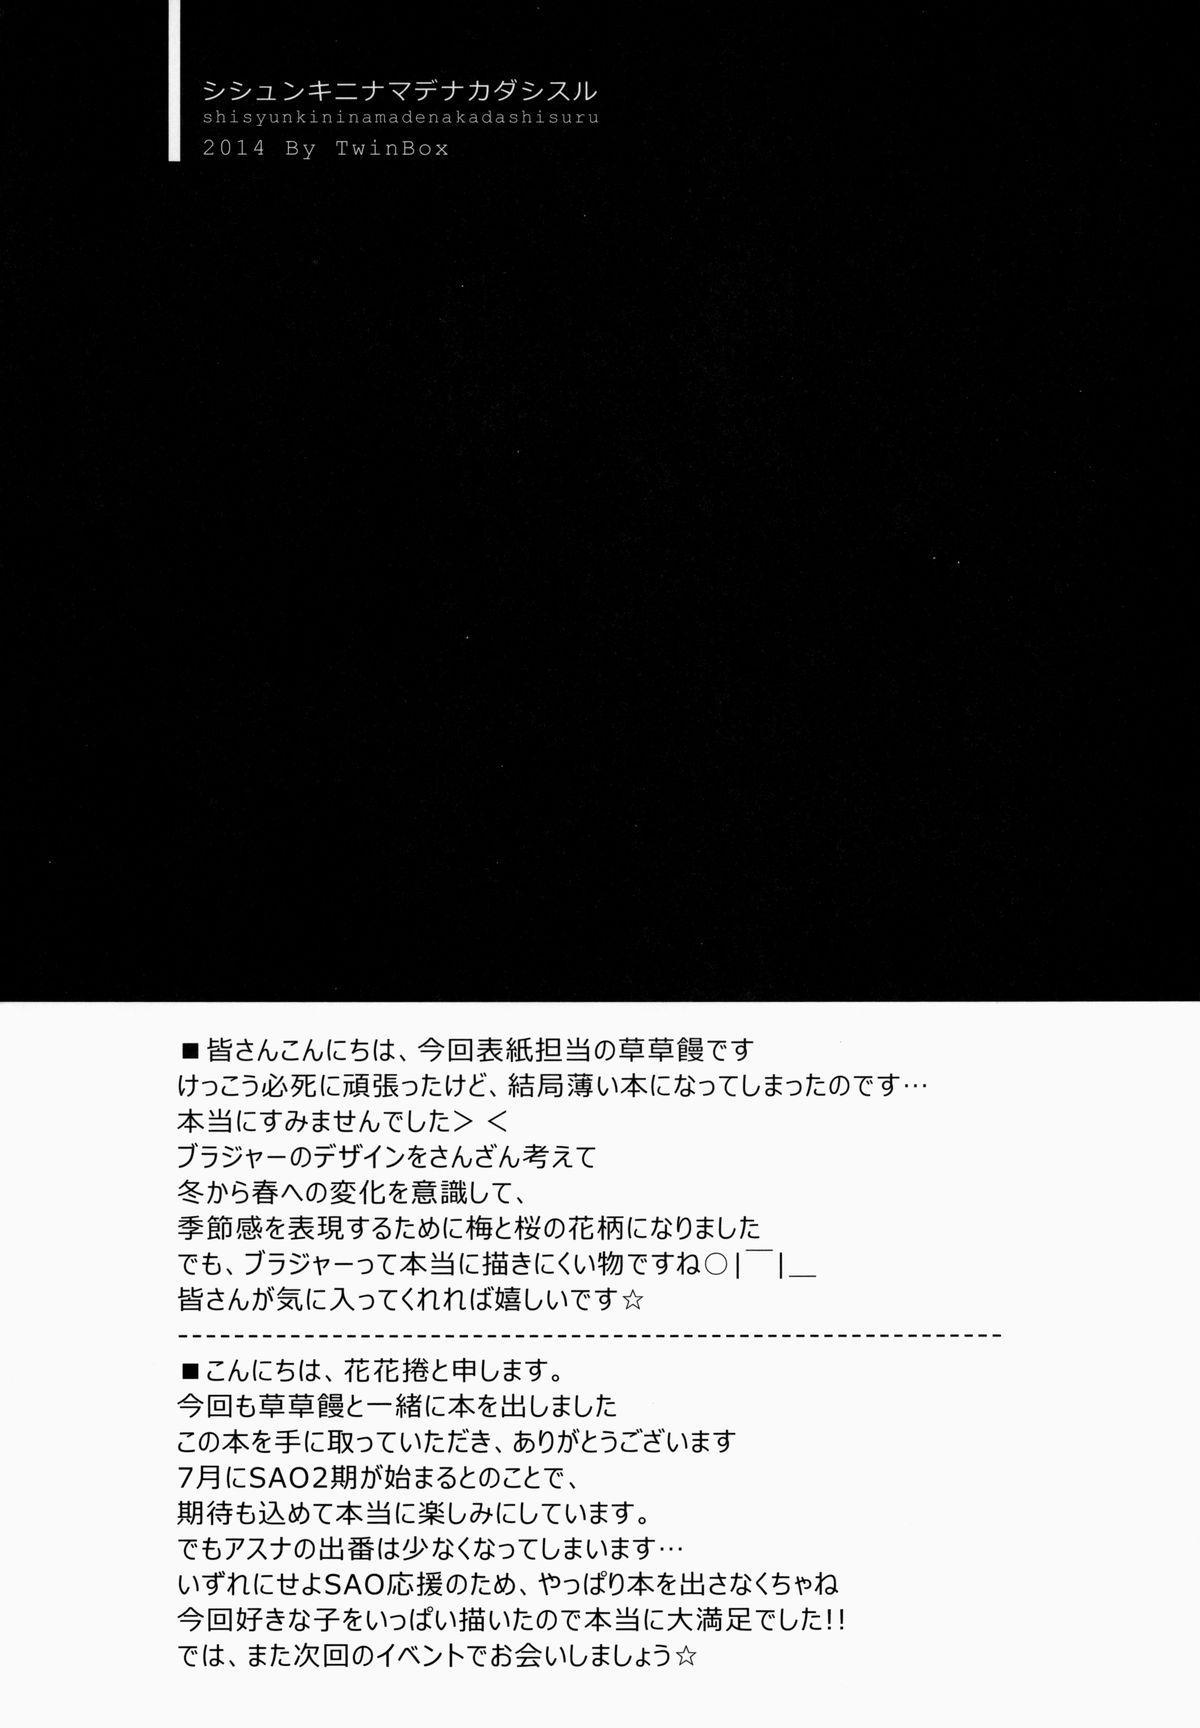 Shishunki ni Nama de Nakadashi suru. | To Cum Inside Raw During Puberty. 15